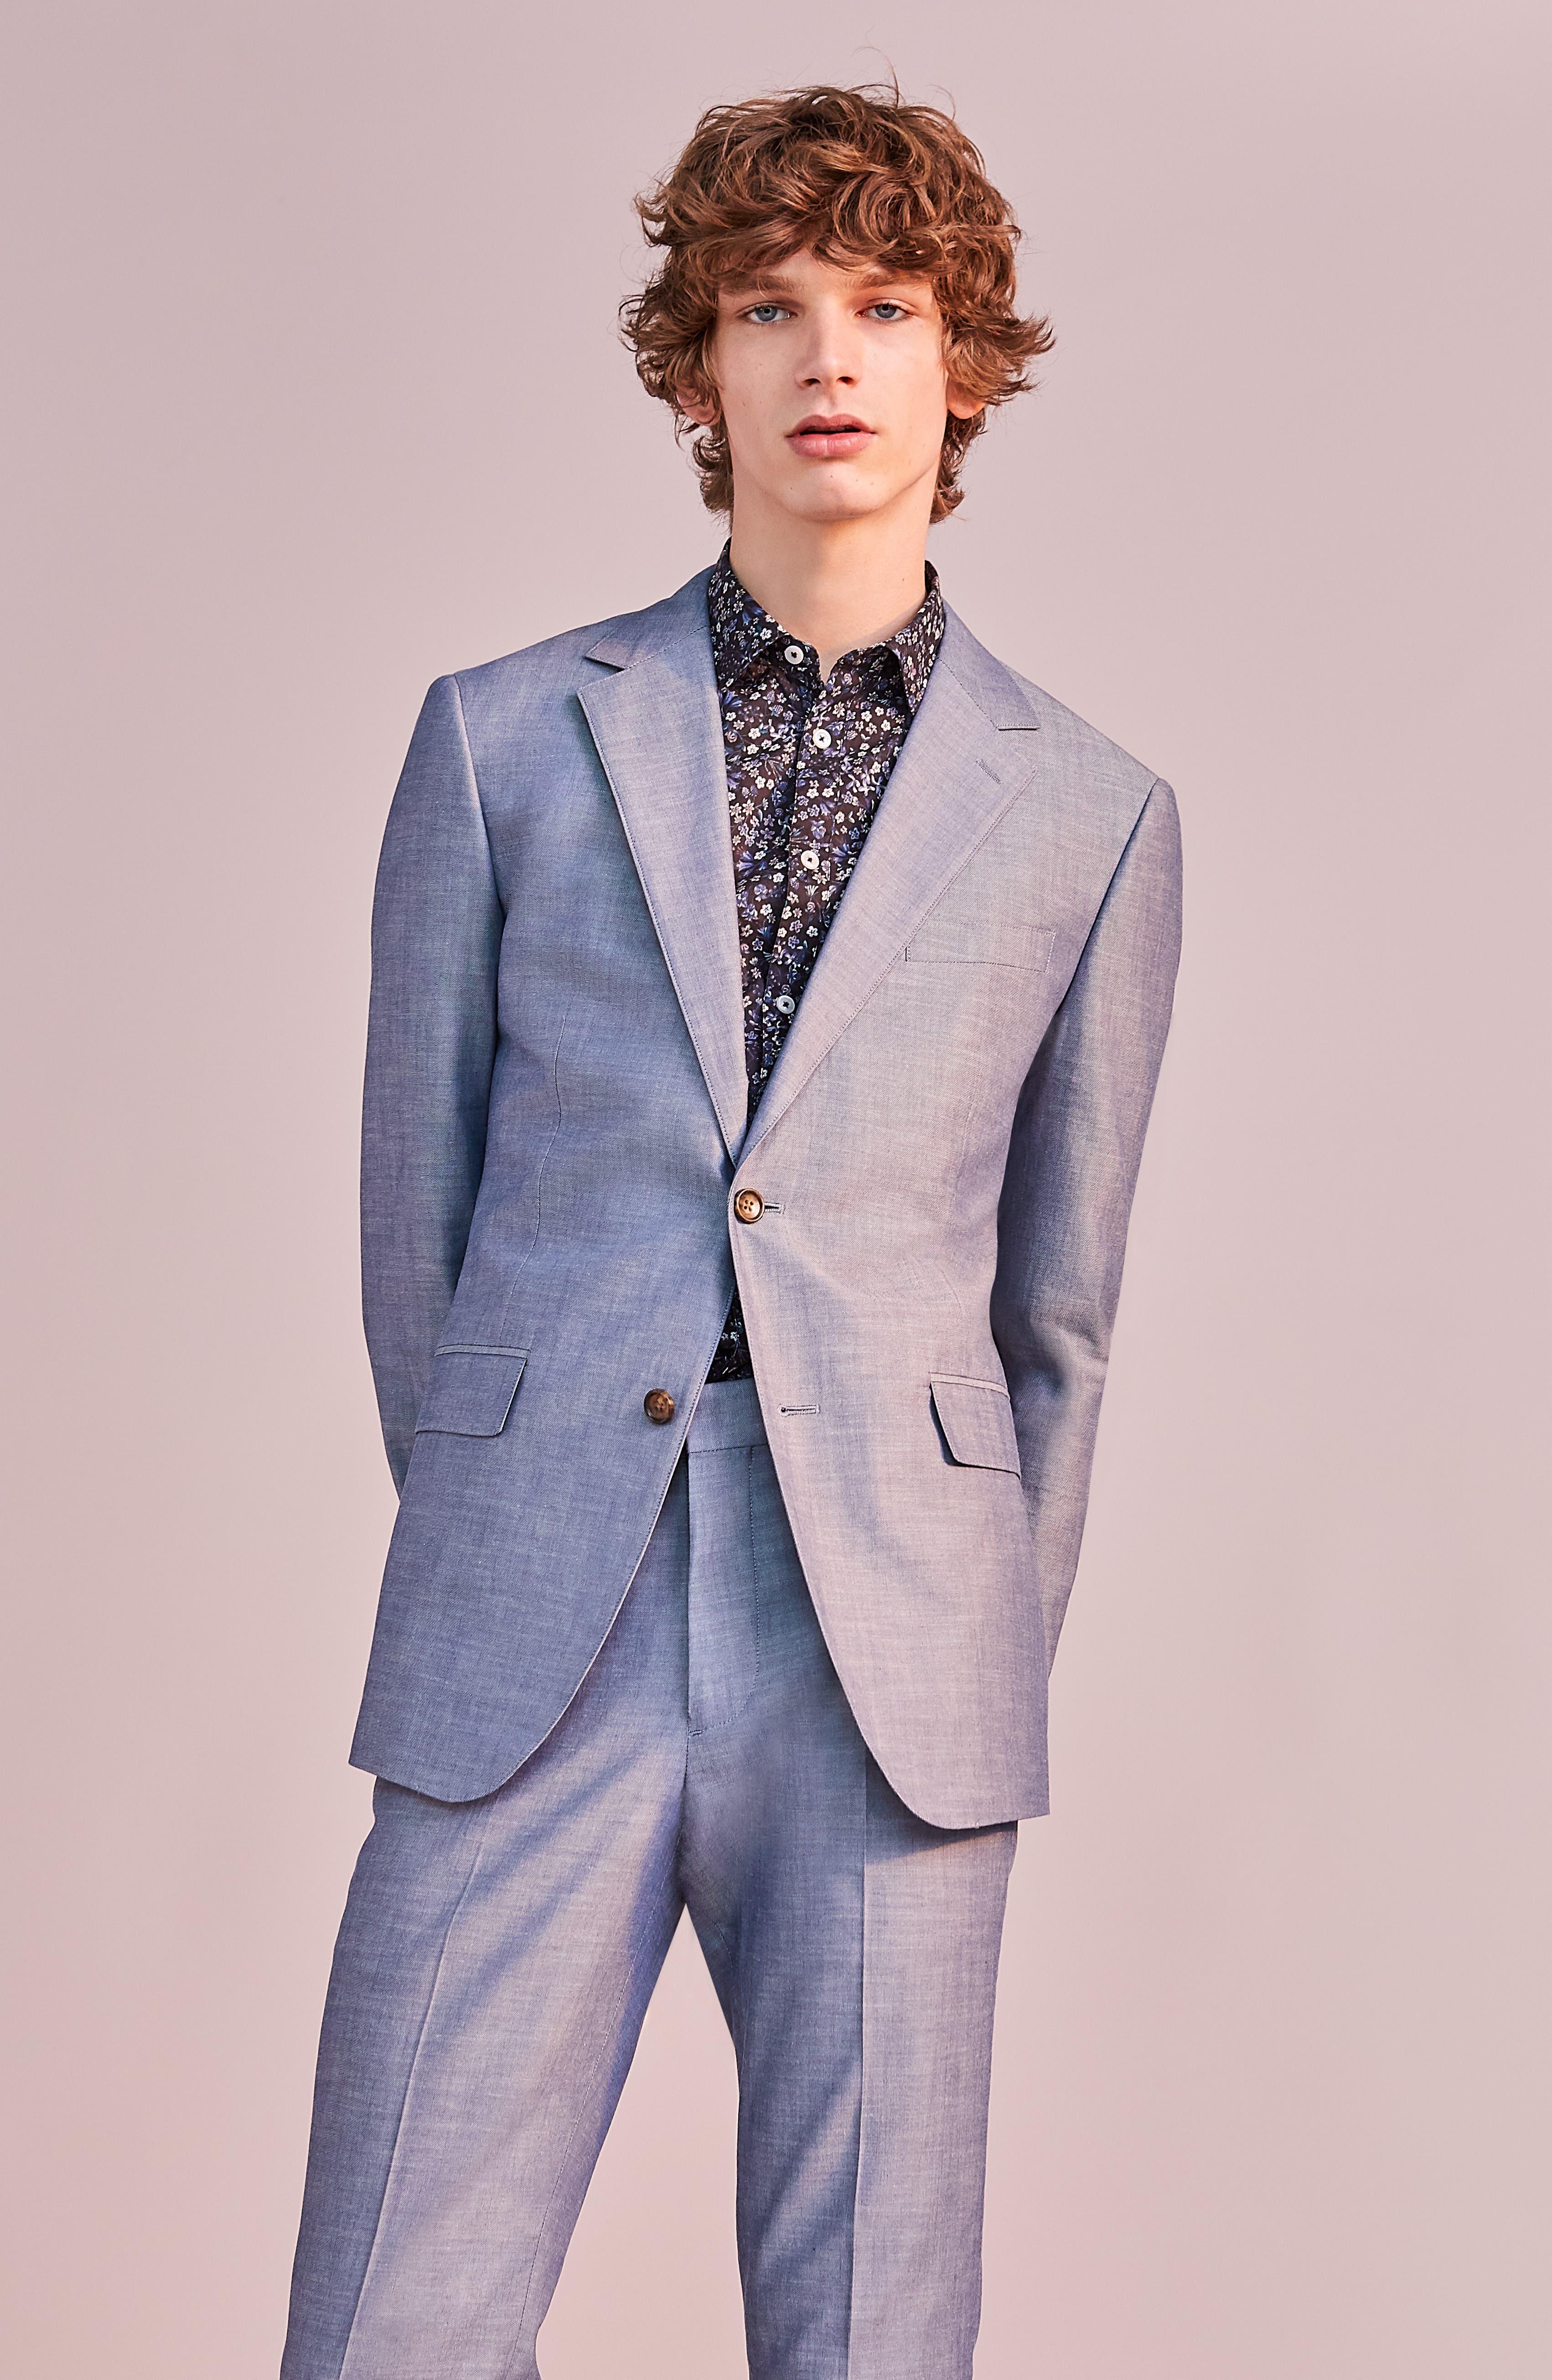 BONOBOS, Slim Fit Chambray Cotton Blazer, Alternate thumbnail 5, color, SOLID BLUE